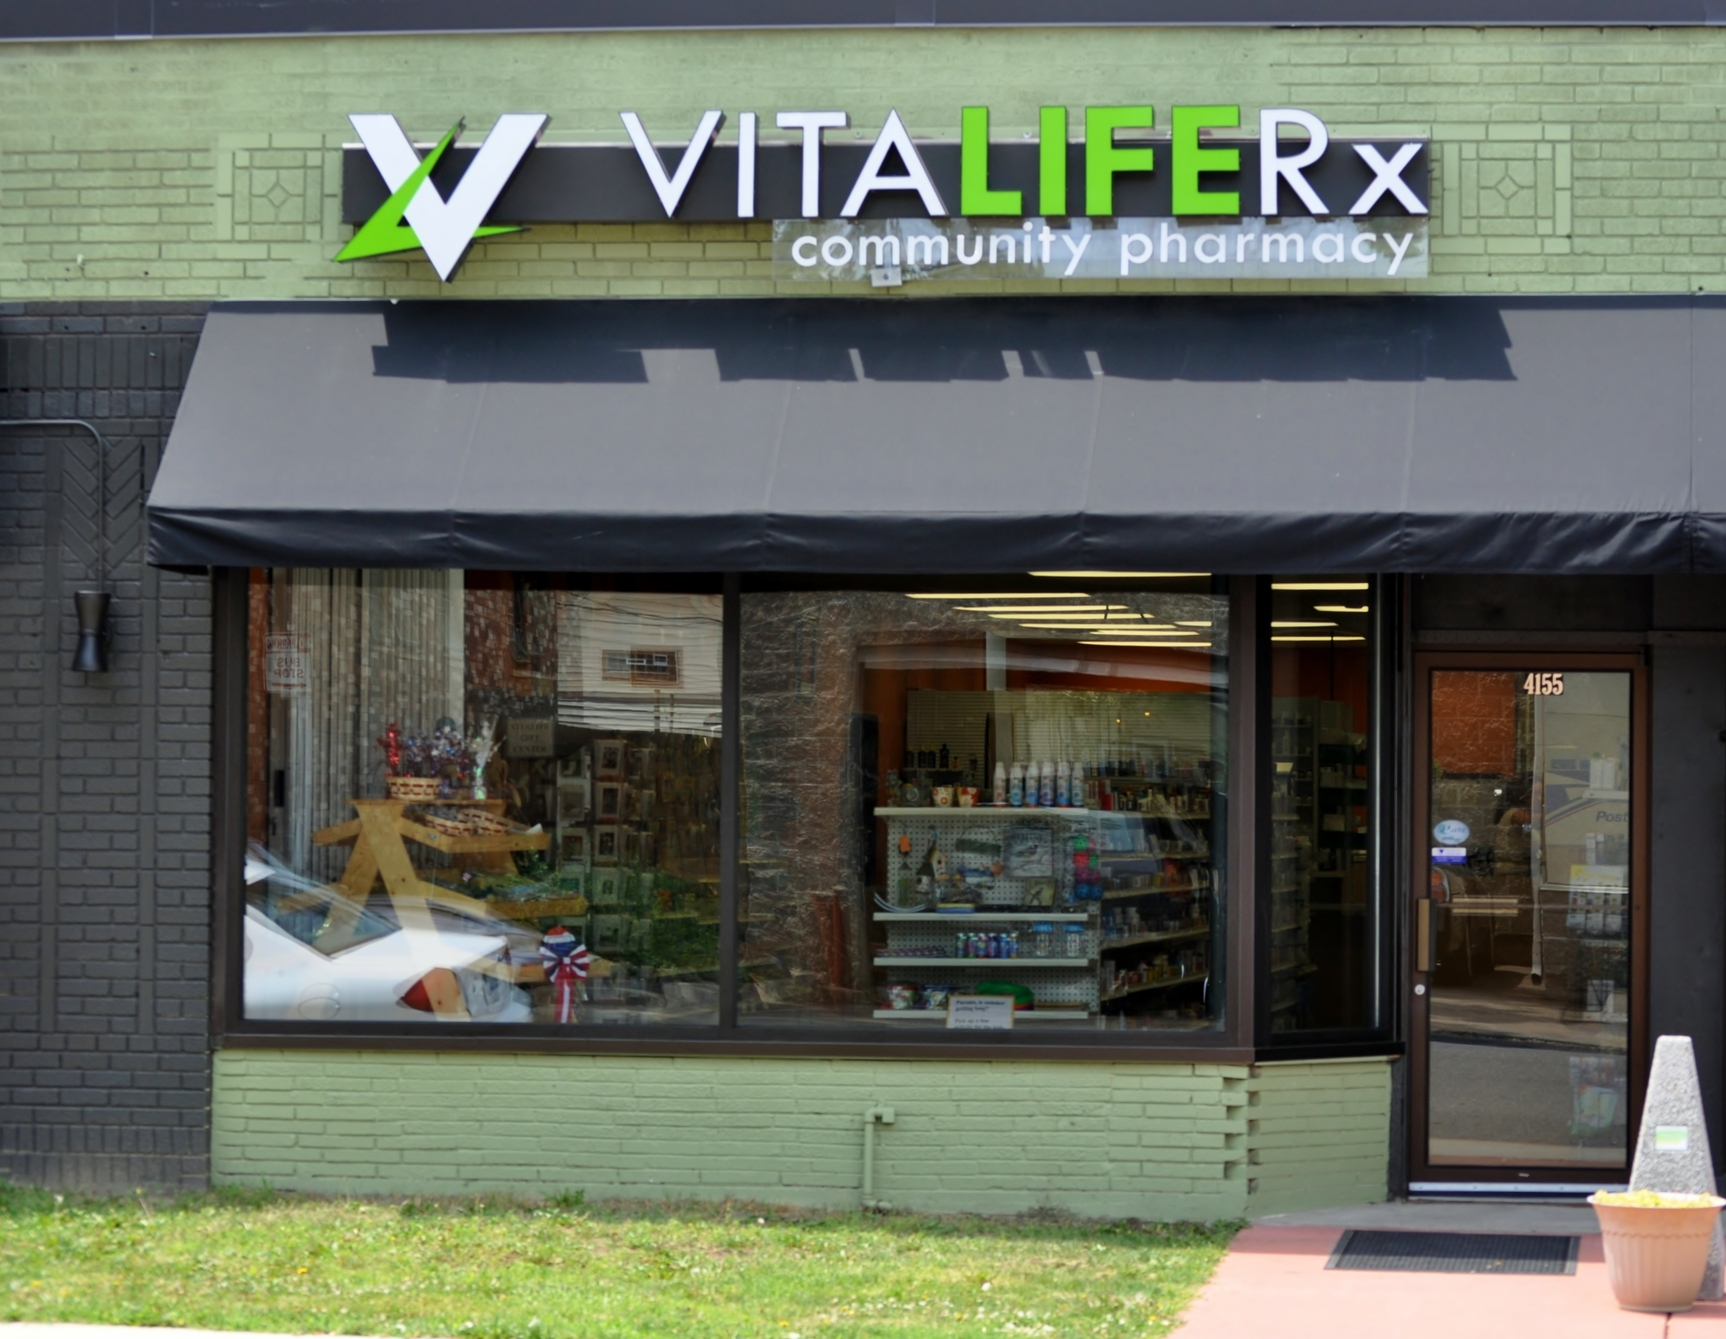 VitaLifeRx